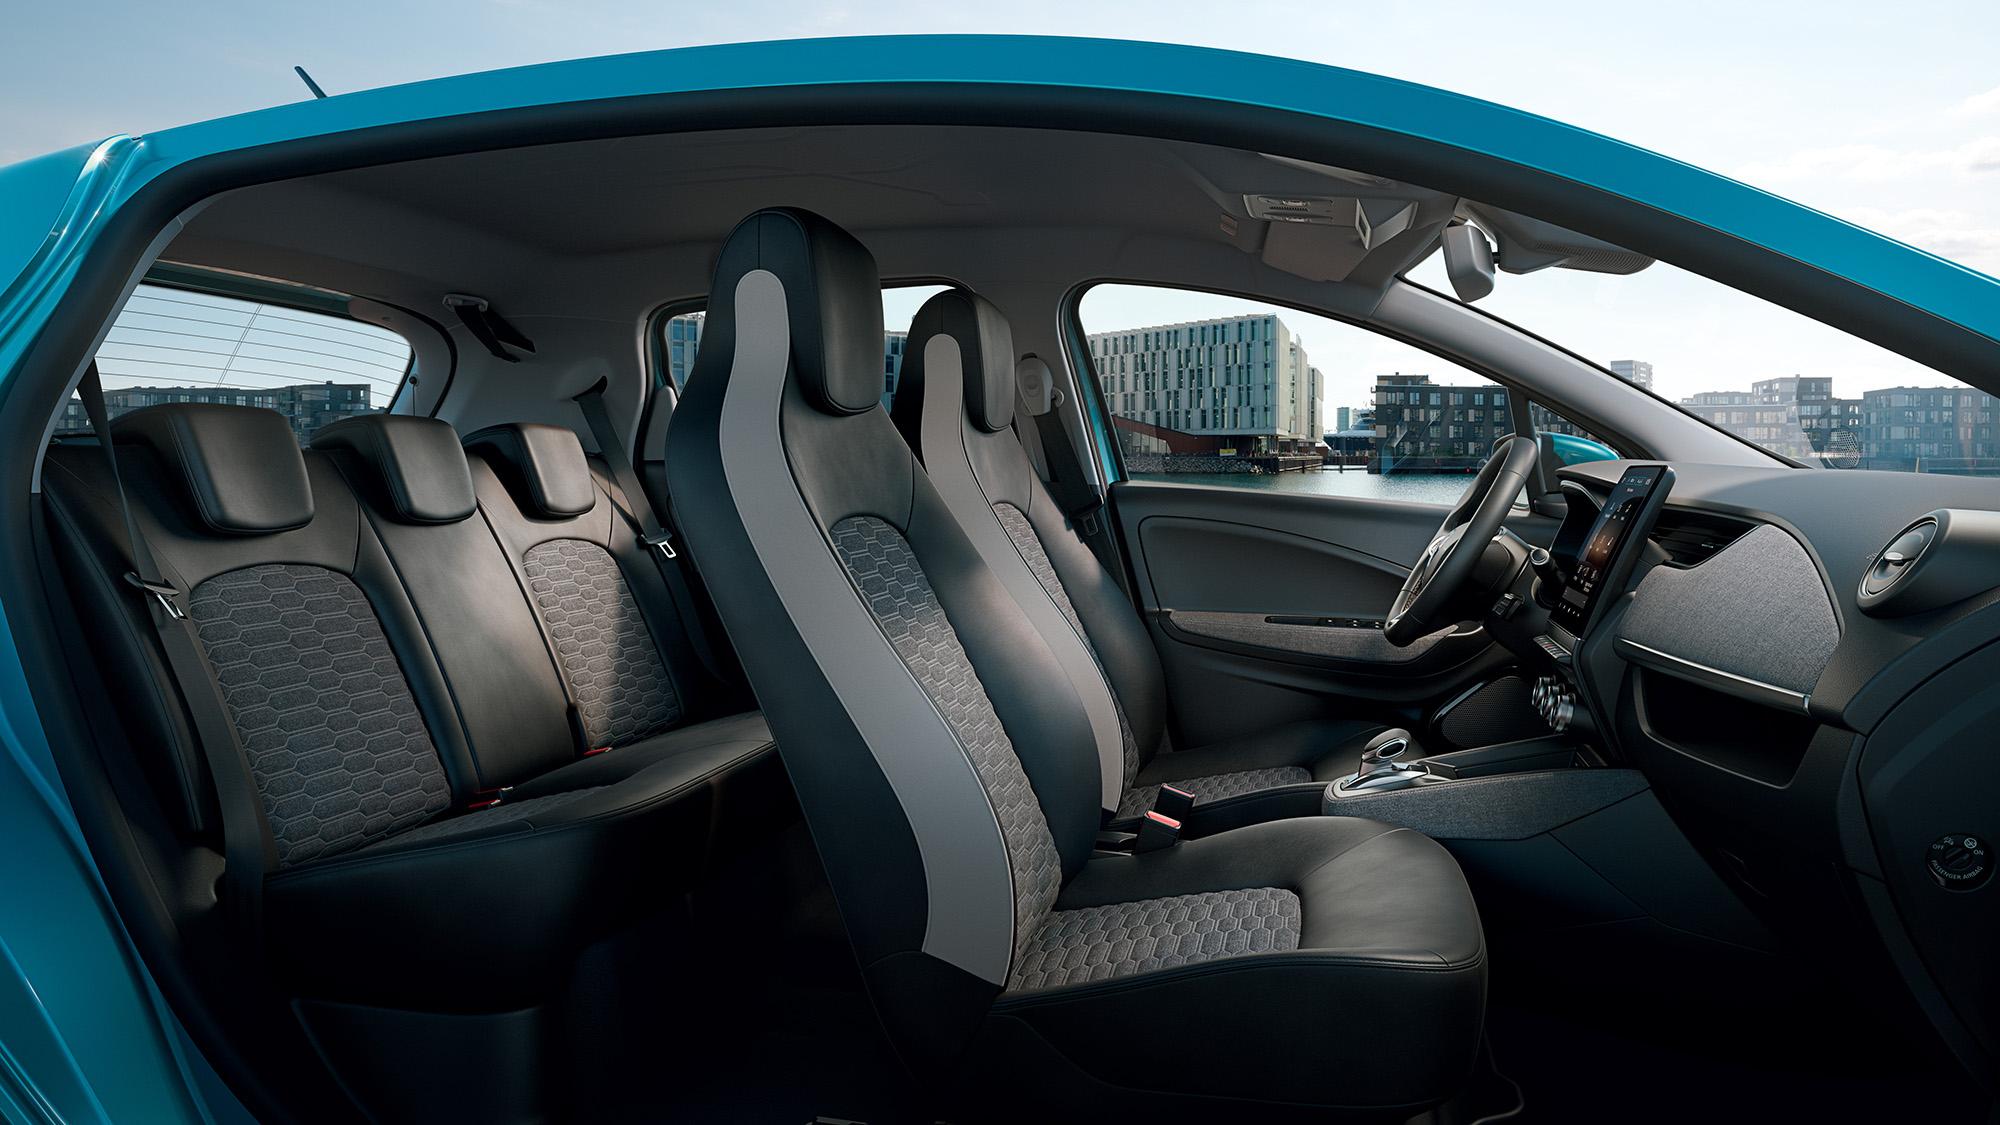 Renault-Zoe-bancos.jpg